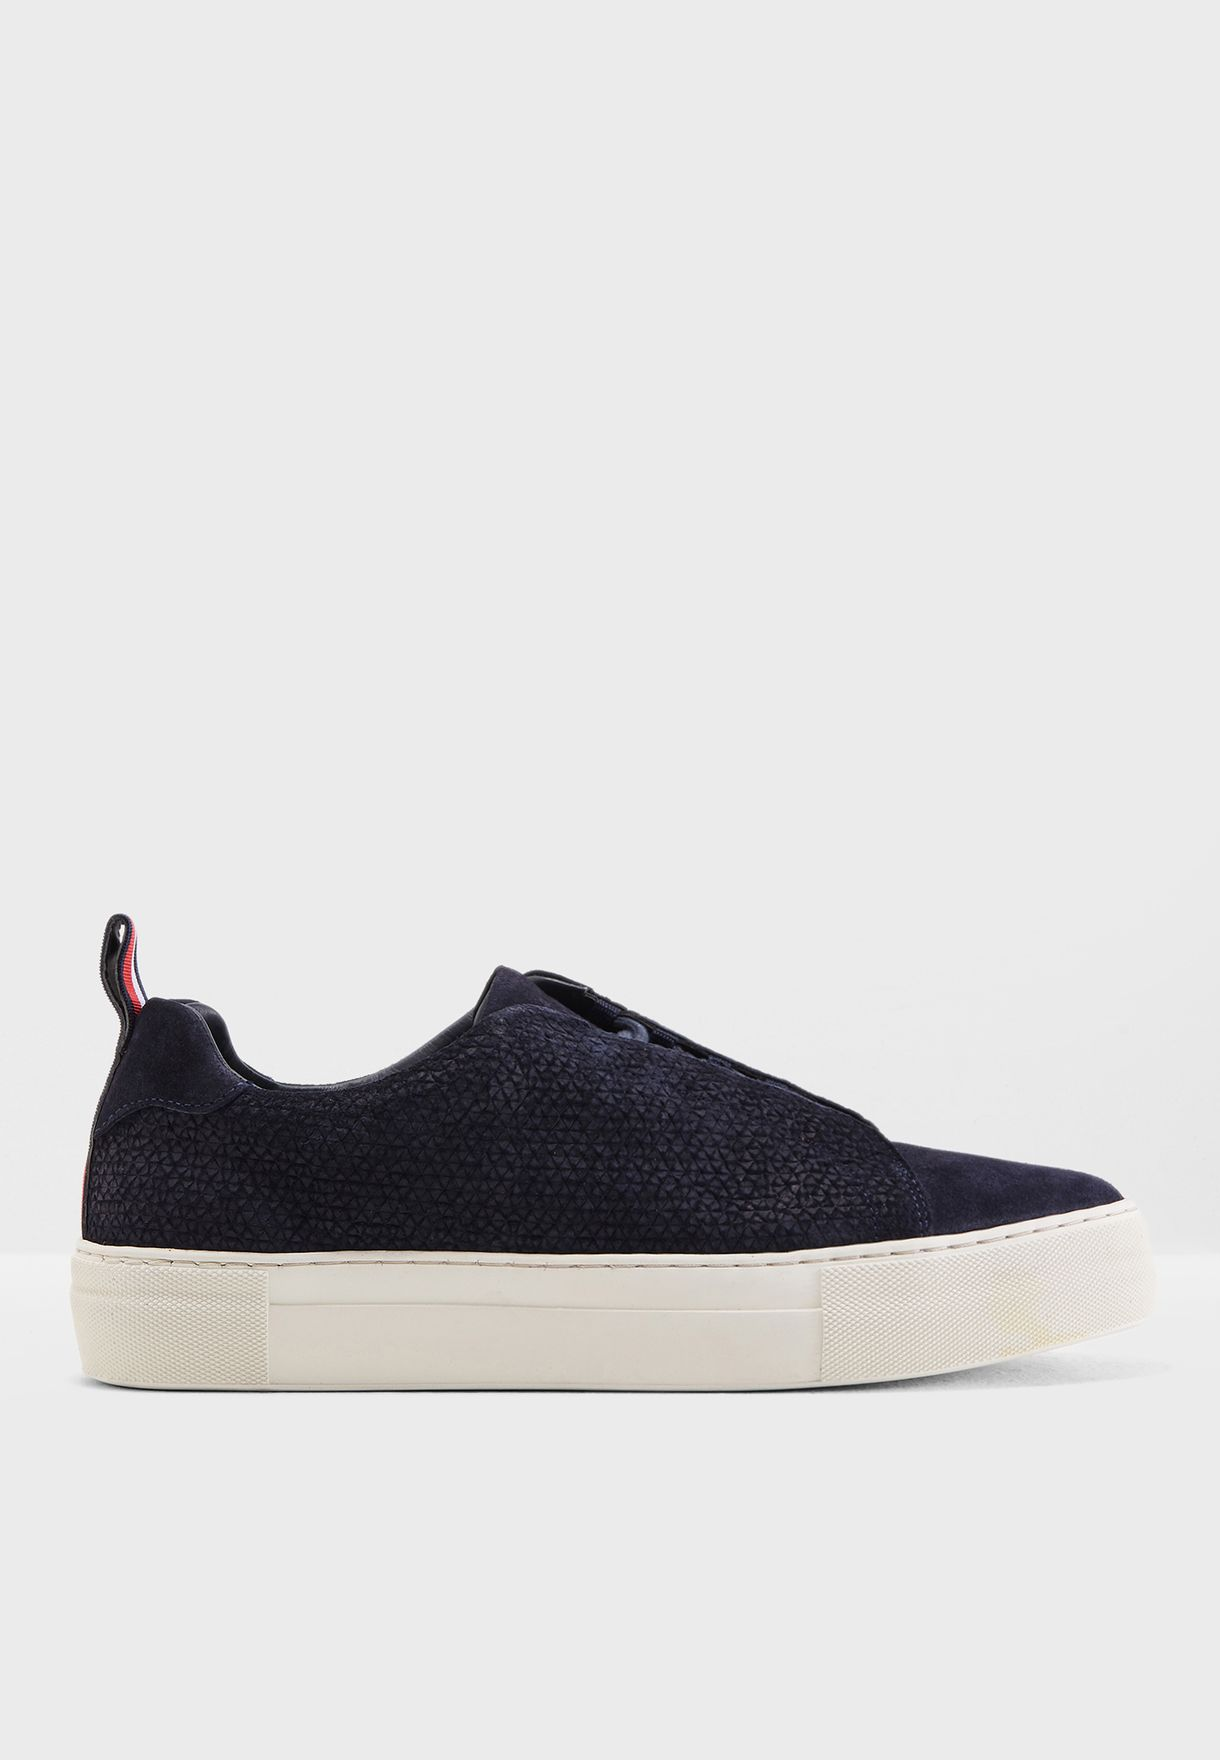 52983c101532 Shop Tommy Hilfiger navy Fashion Suede Cupsole Sneakers FM0FM01816 ...